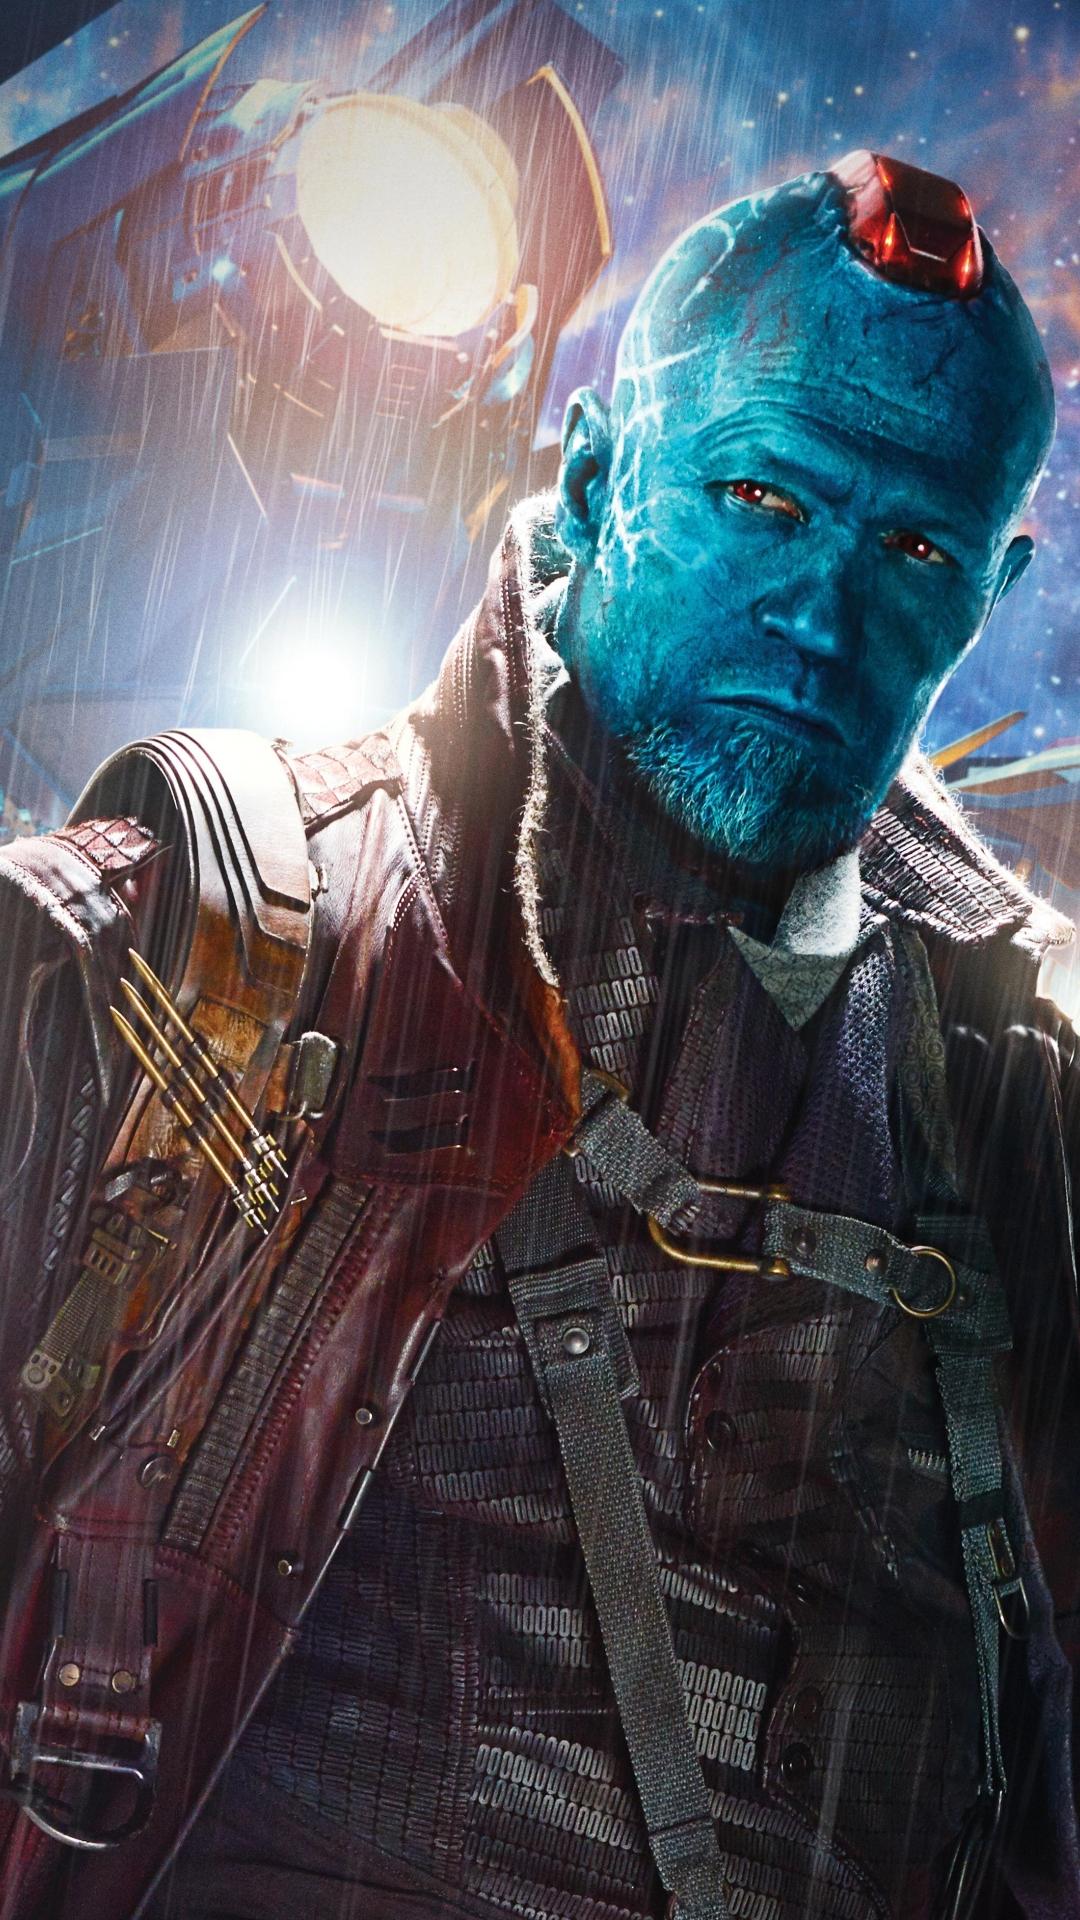 Yondu Udonta Guardians Of The Galaxy, HD 4K Wallpaper